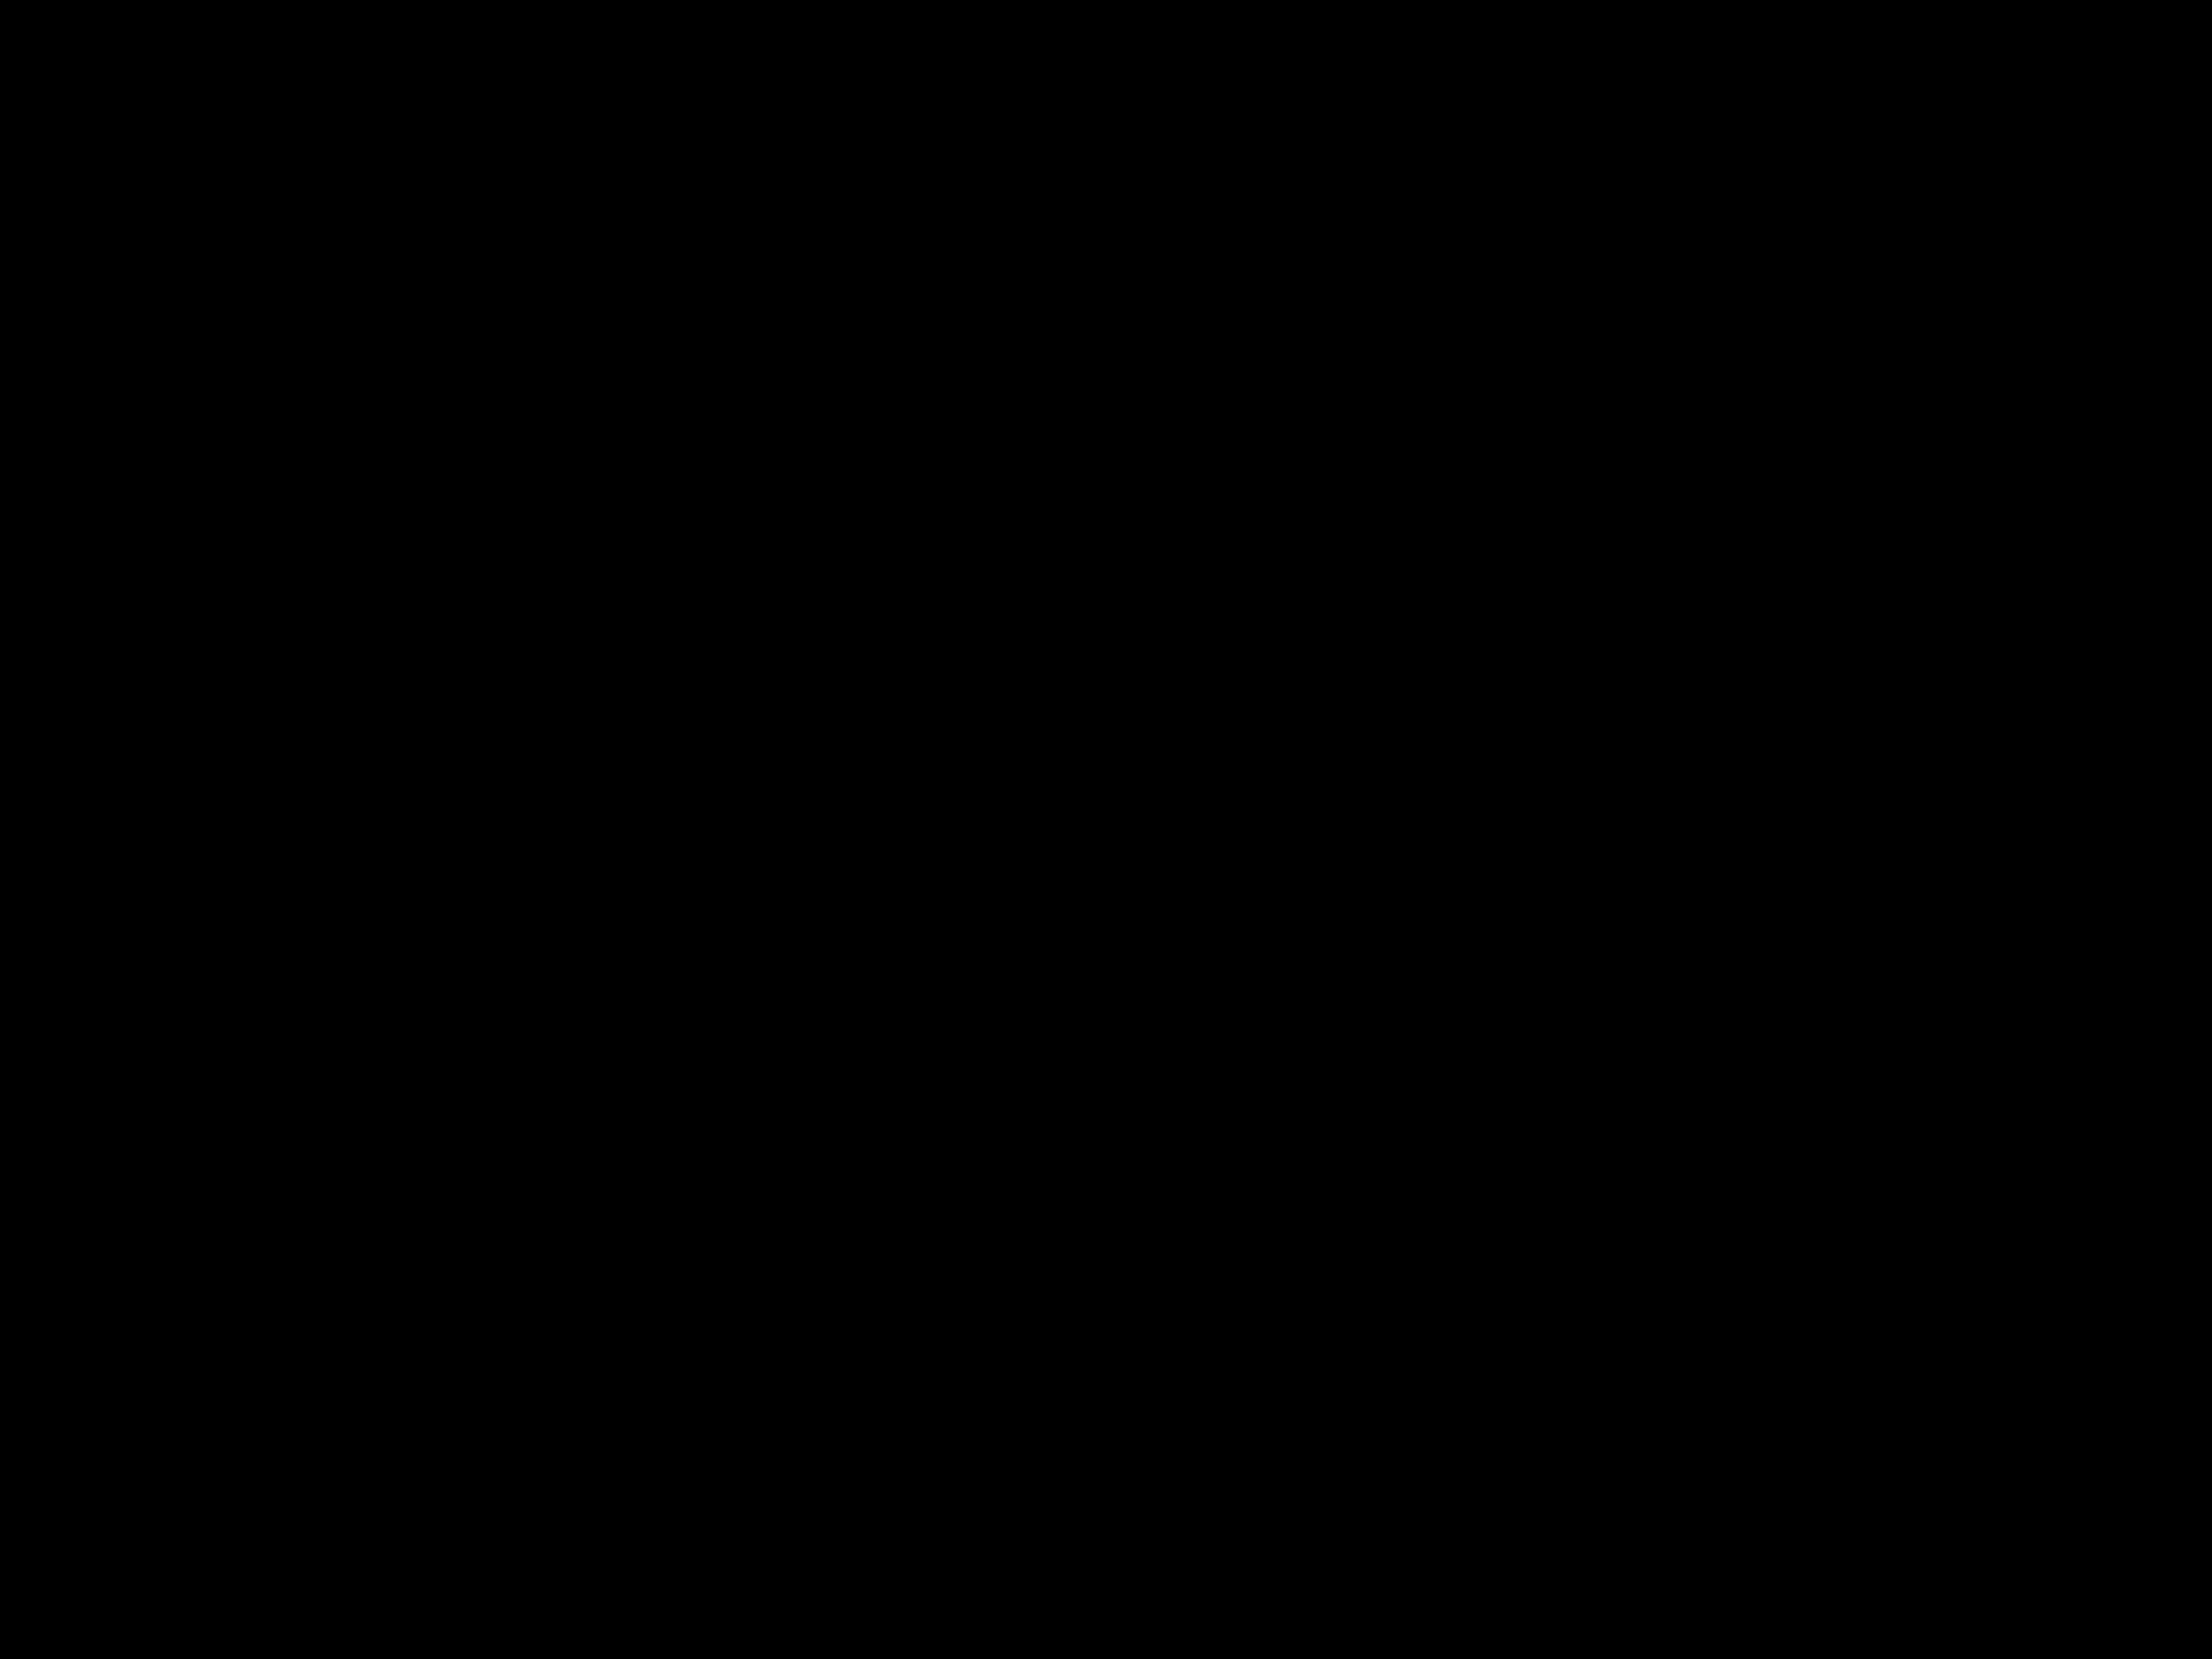 2400x1800 Clipart